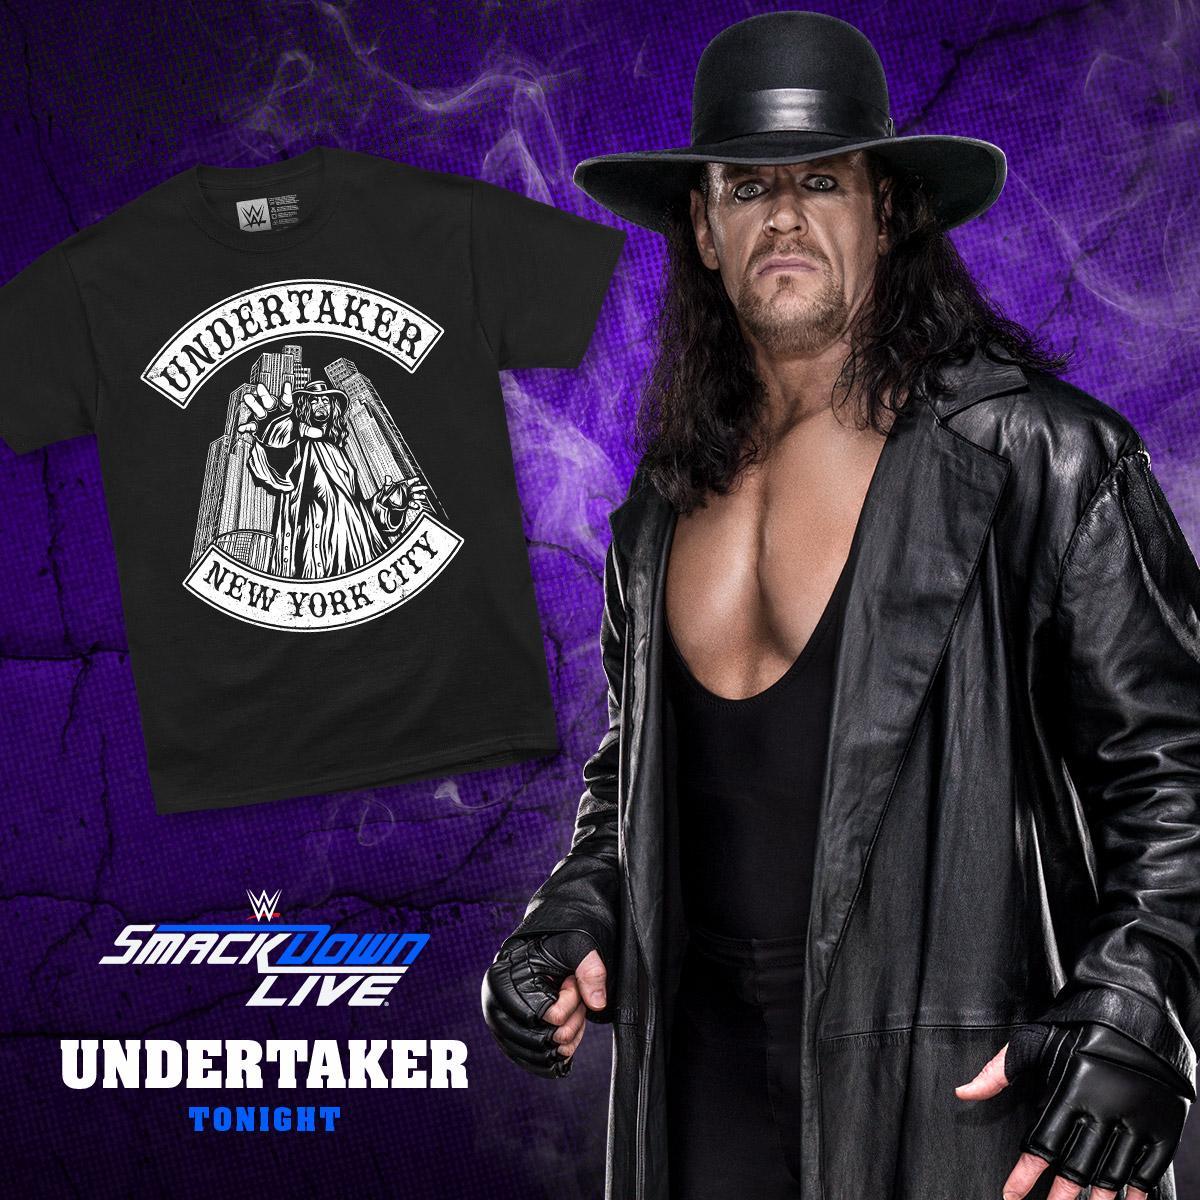 @WWEShop's photo on Undertaker